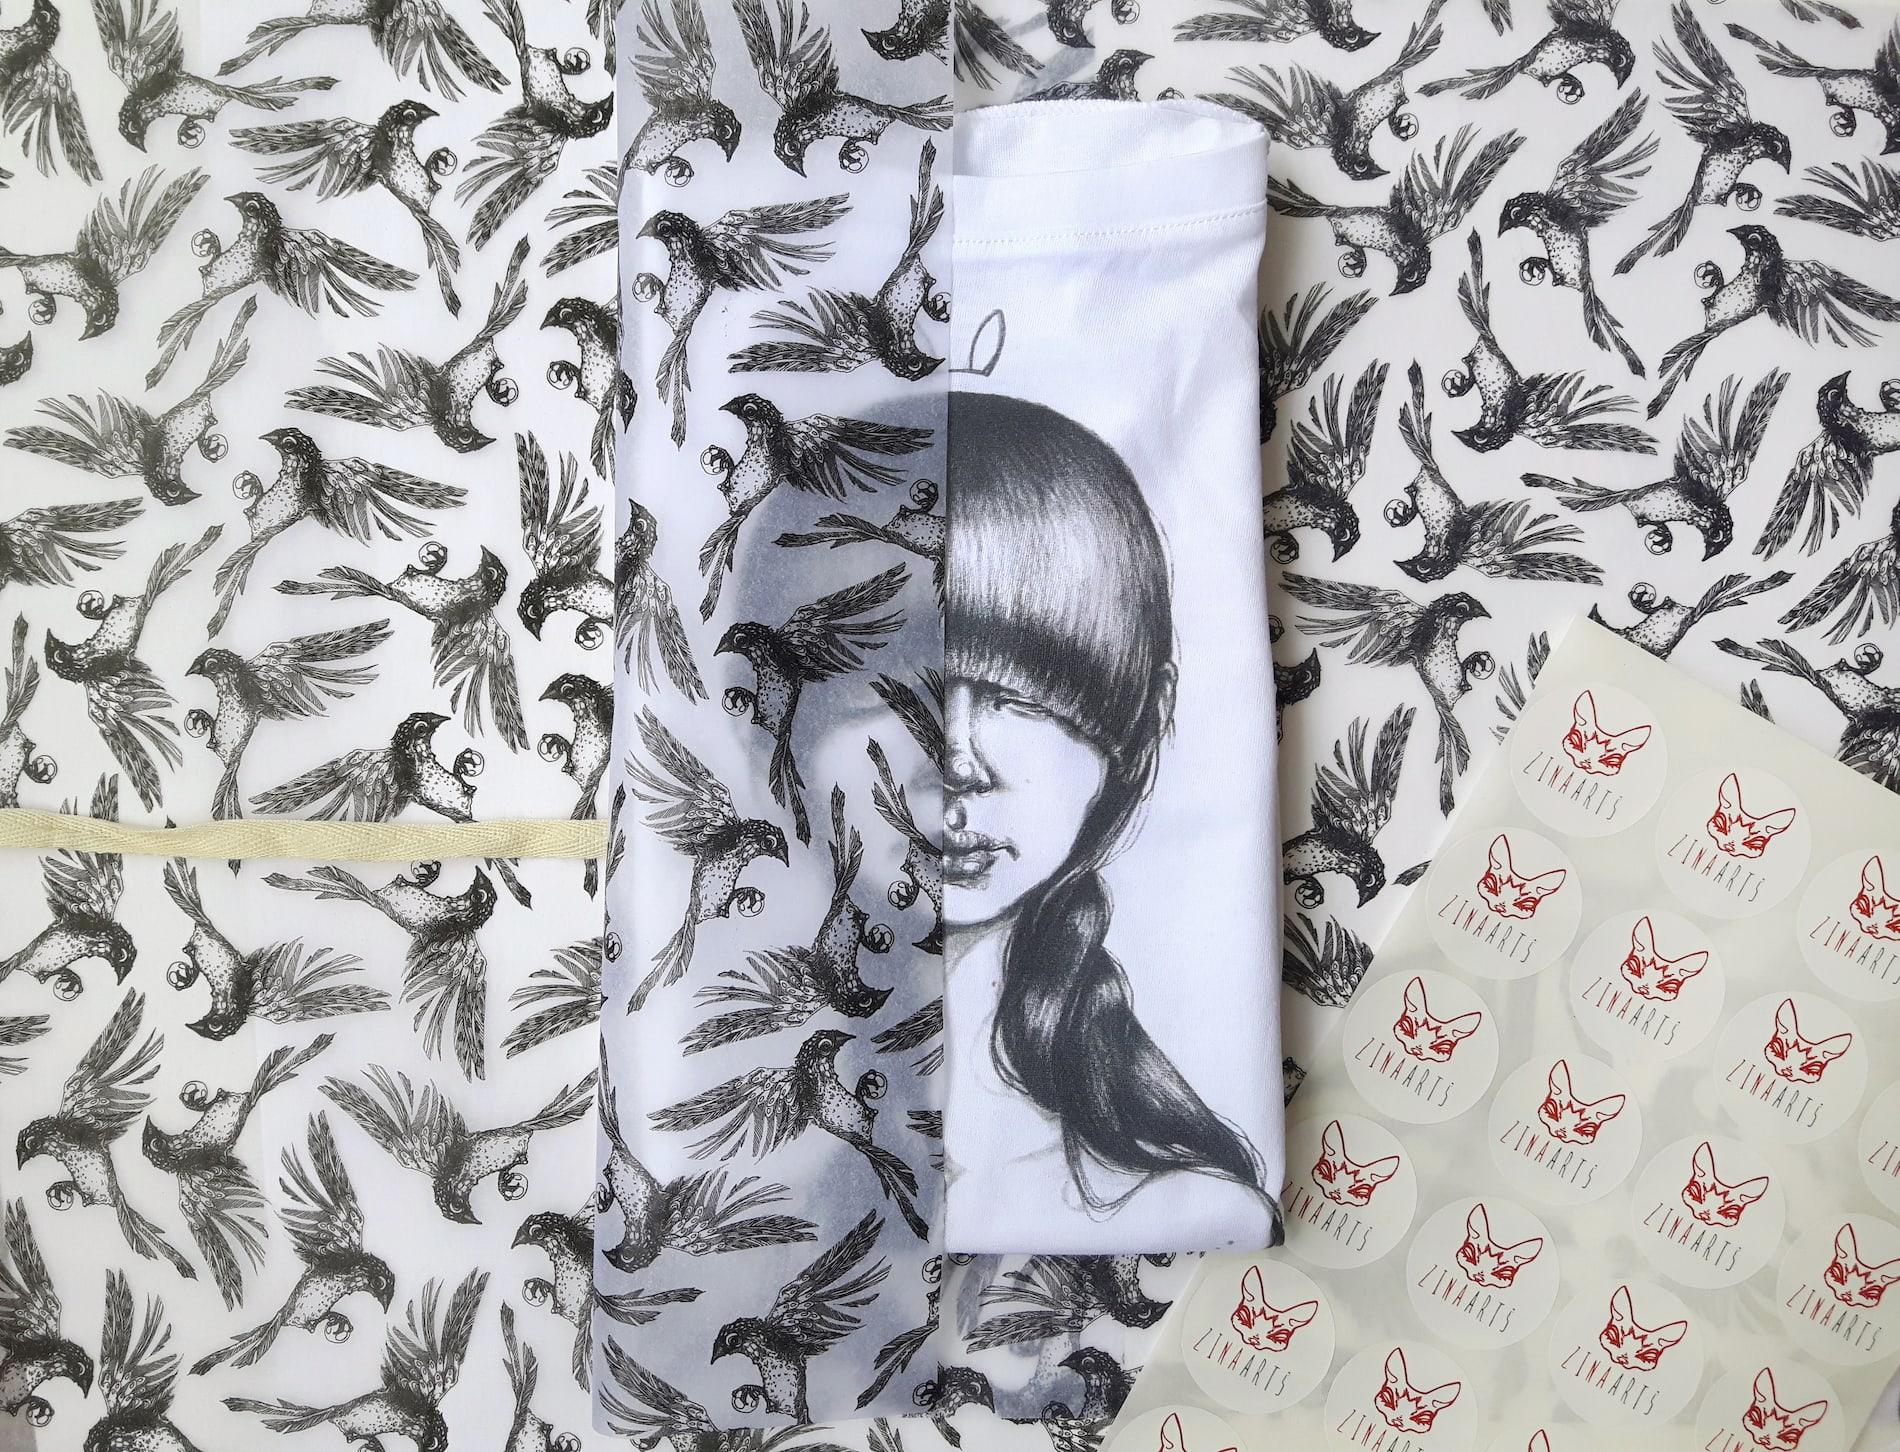 Zina Arts custom tissue paper